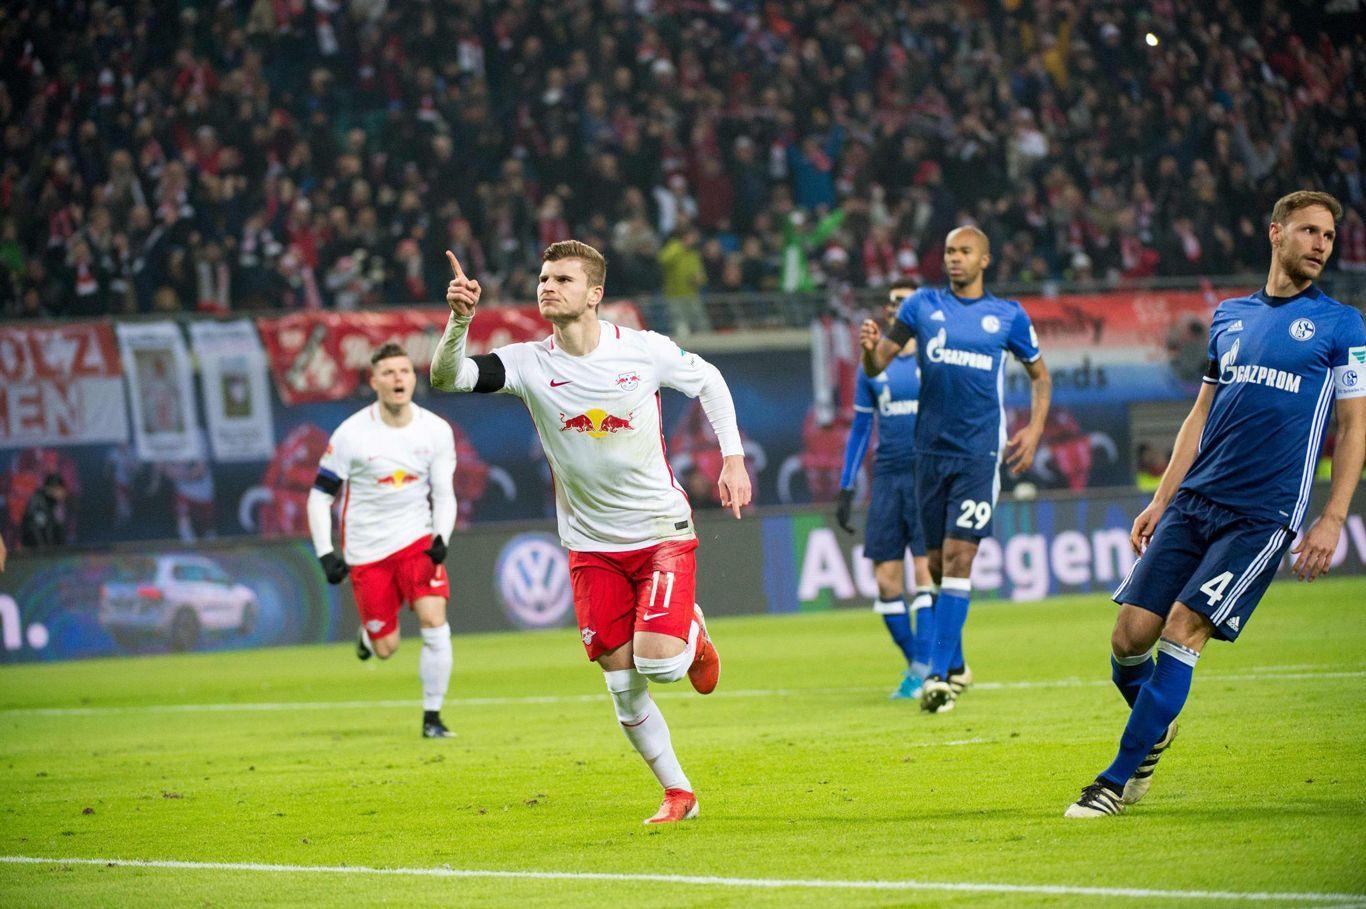 Прогноз на матч: Шальке 04 — Лейпциг